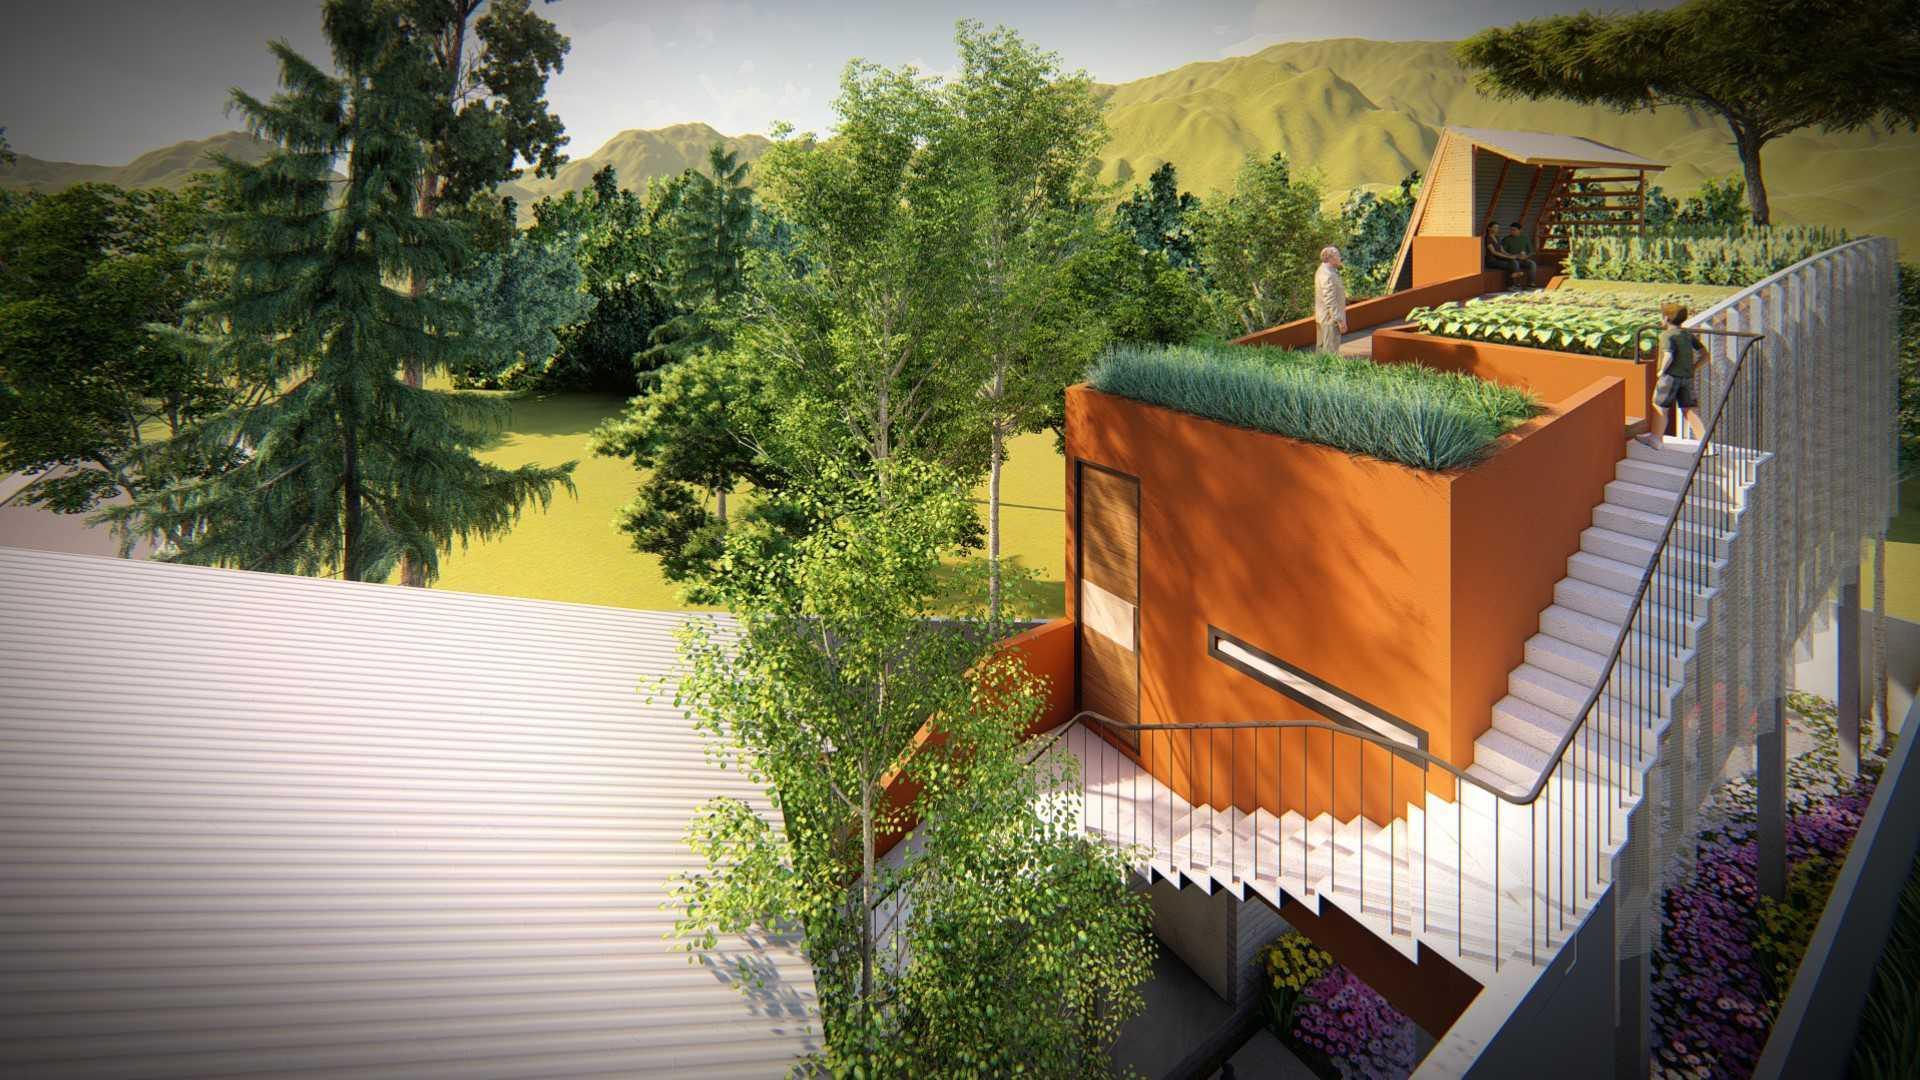 Slight Architect House Sumore Kota Manado, Sulawesi Utara, Indonesia Kota Manado, Sulawesi Utara, Indonesia Slight-Architect-House-Sumore   122814